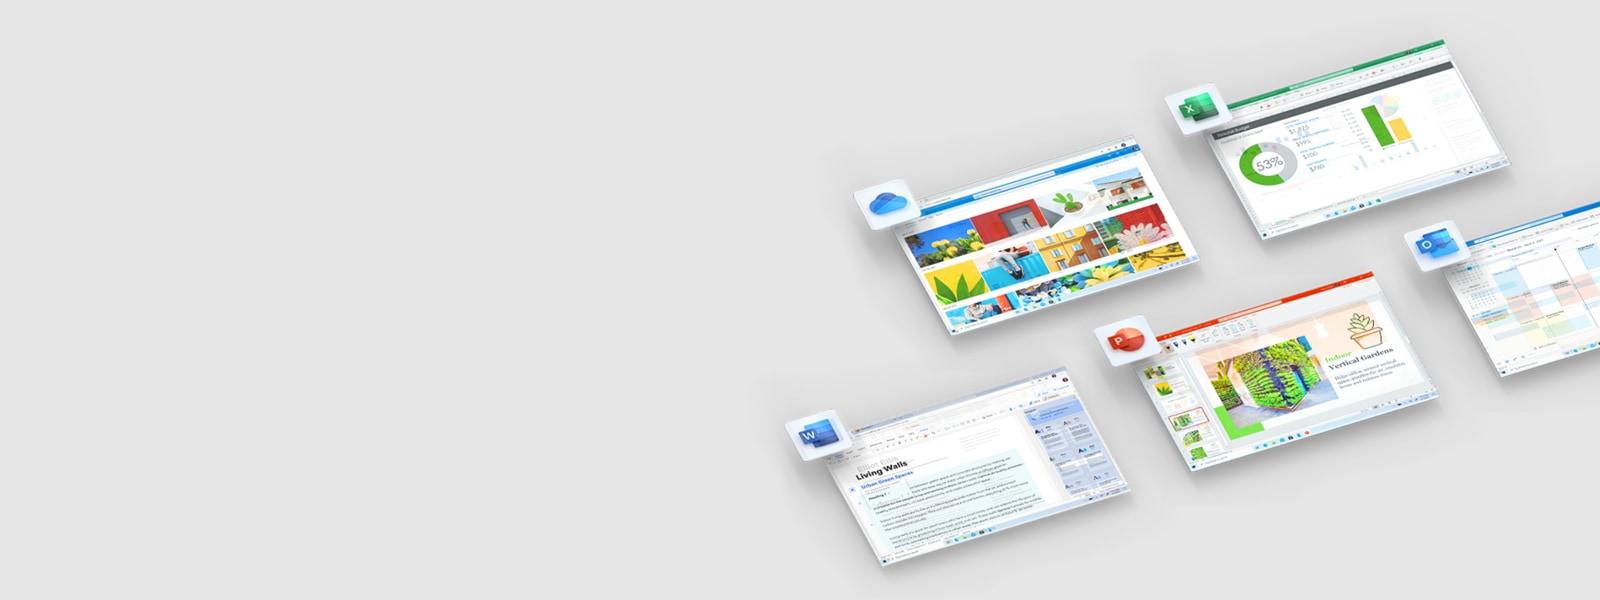 Layar dan ikon aplikasi untuk aplikasi Office yang merupakan bagian dari Microsoft 365